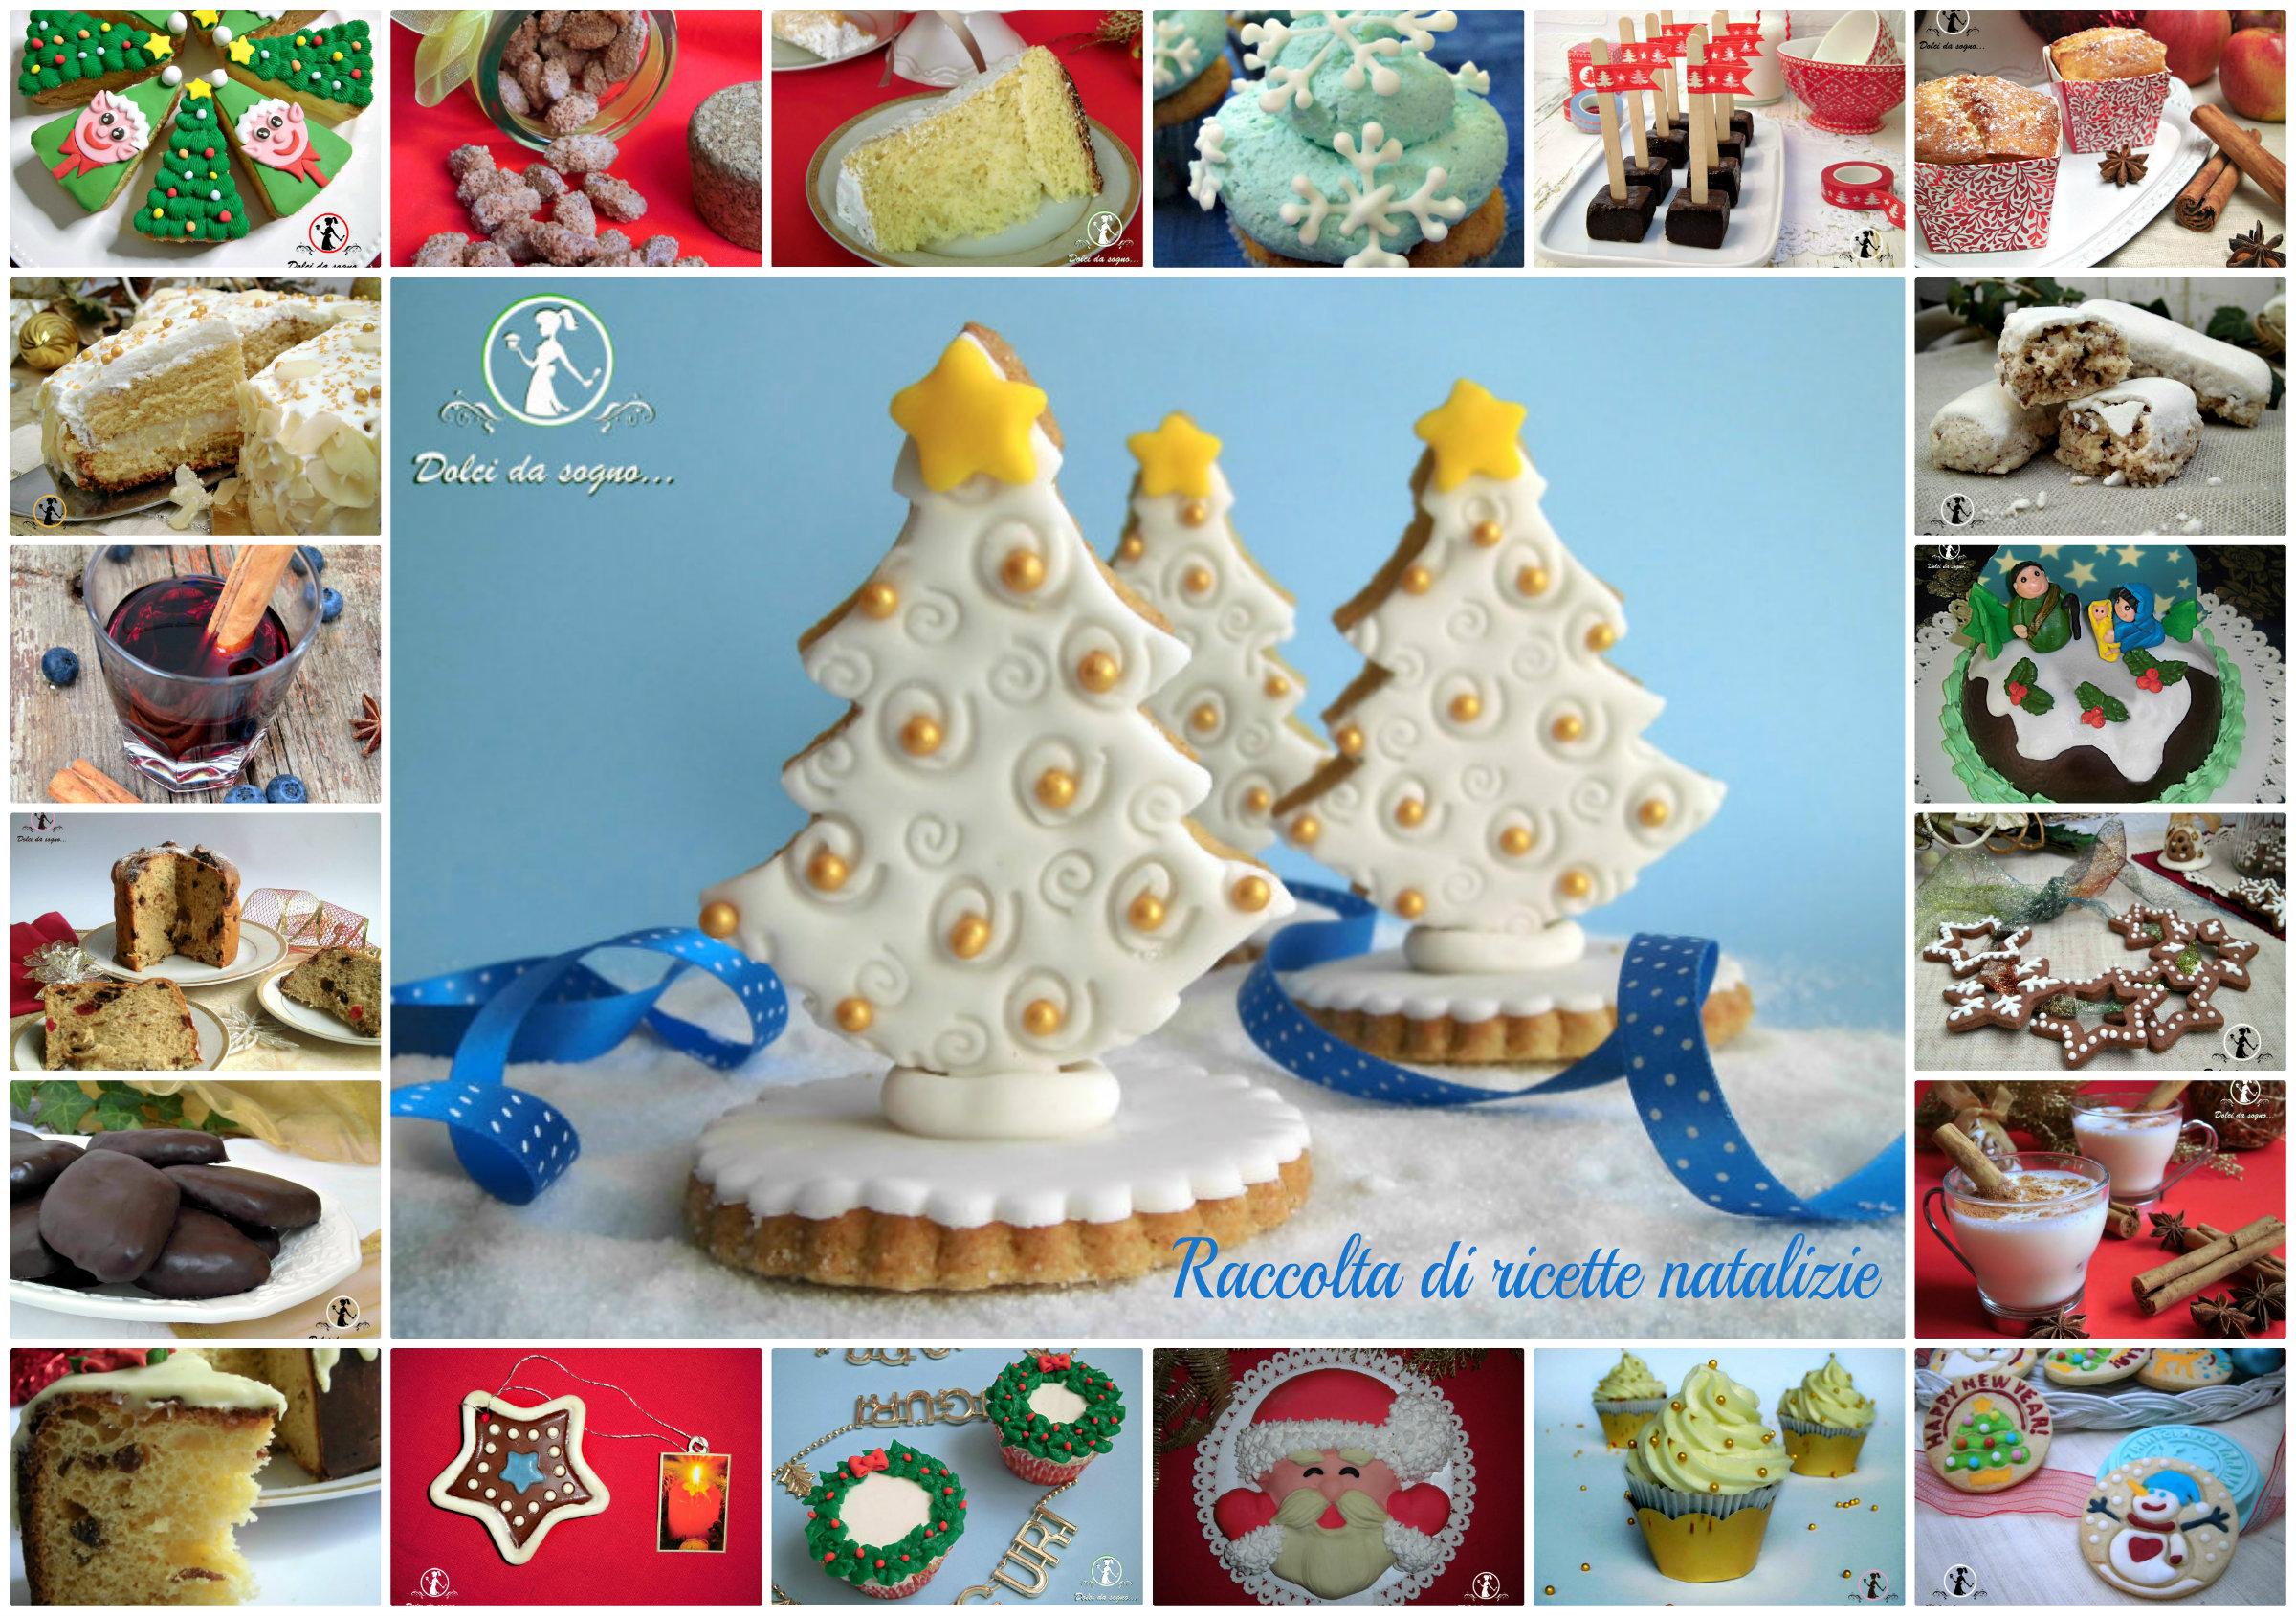 Raccolta di ricette natalizie